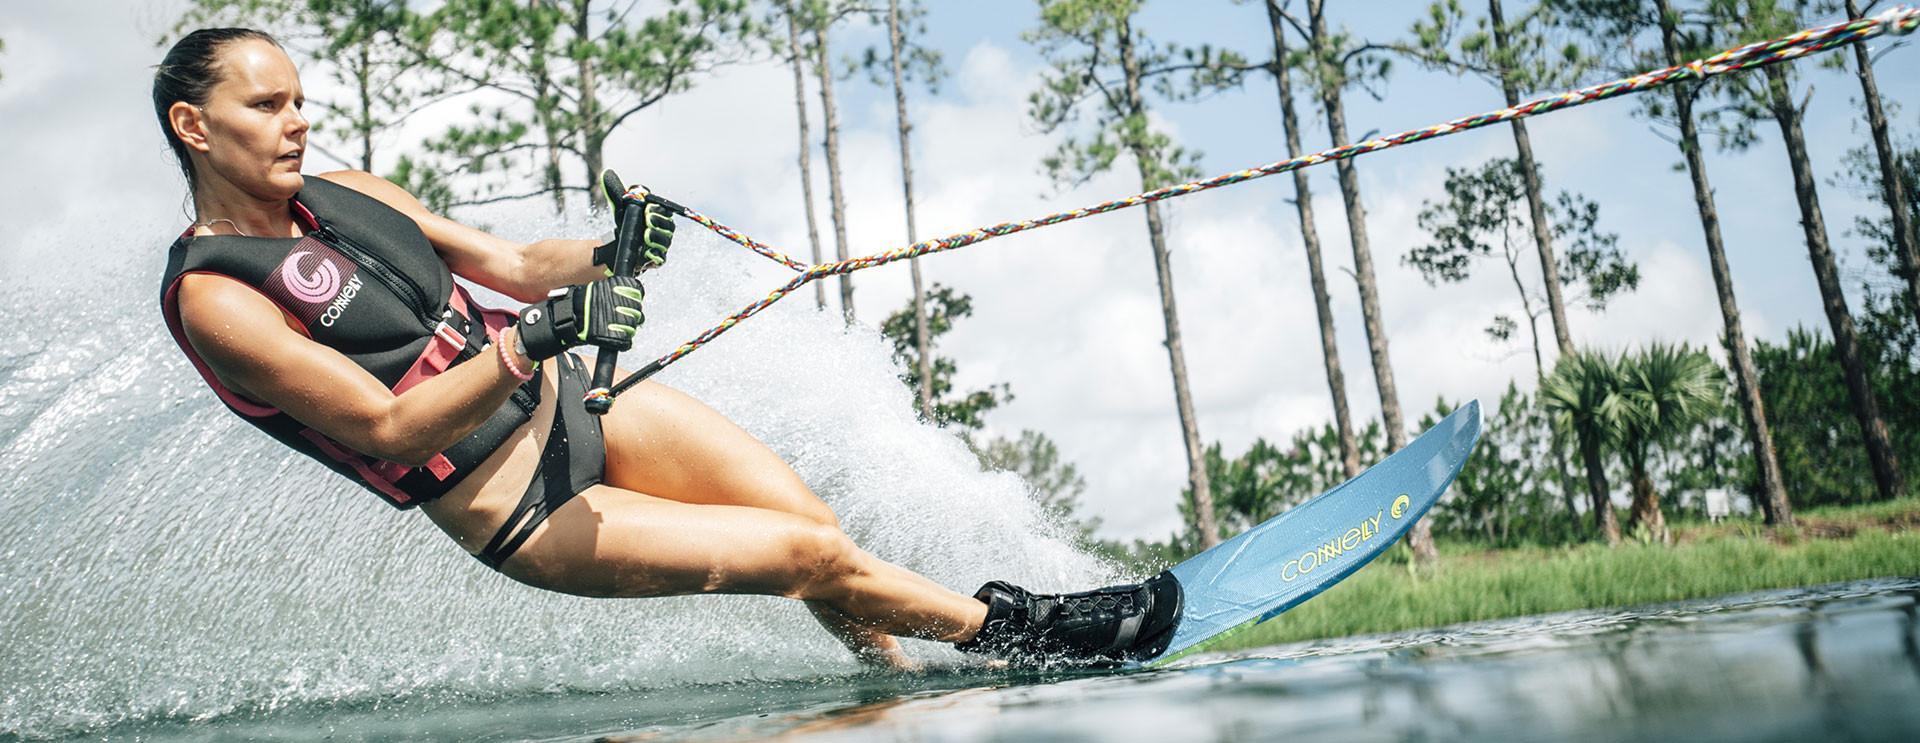 Aquaski Water Ski Tow Harness